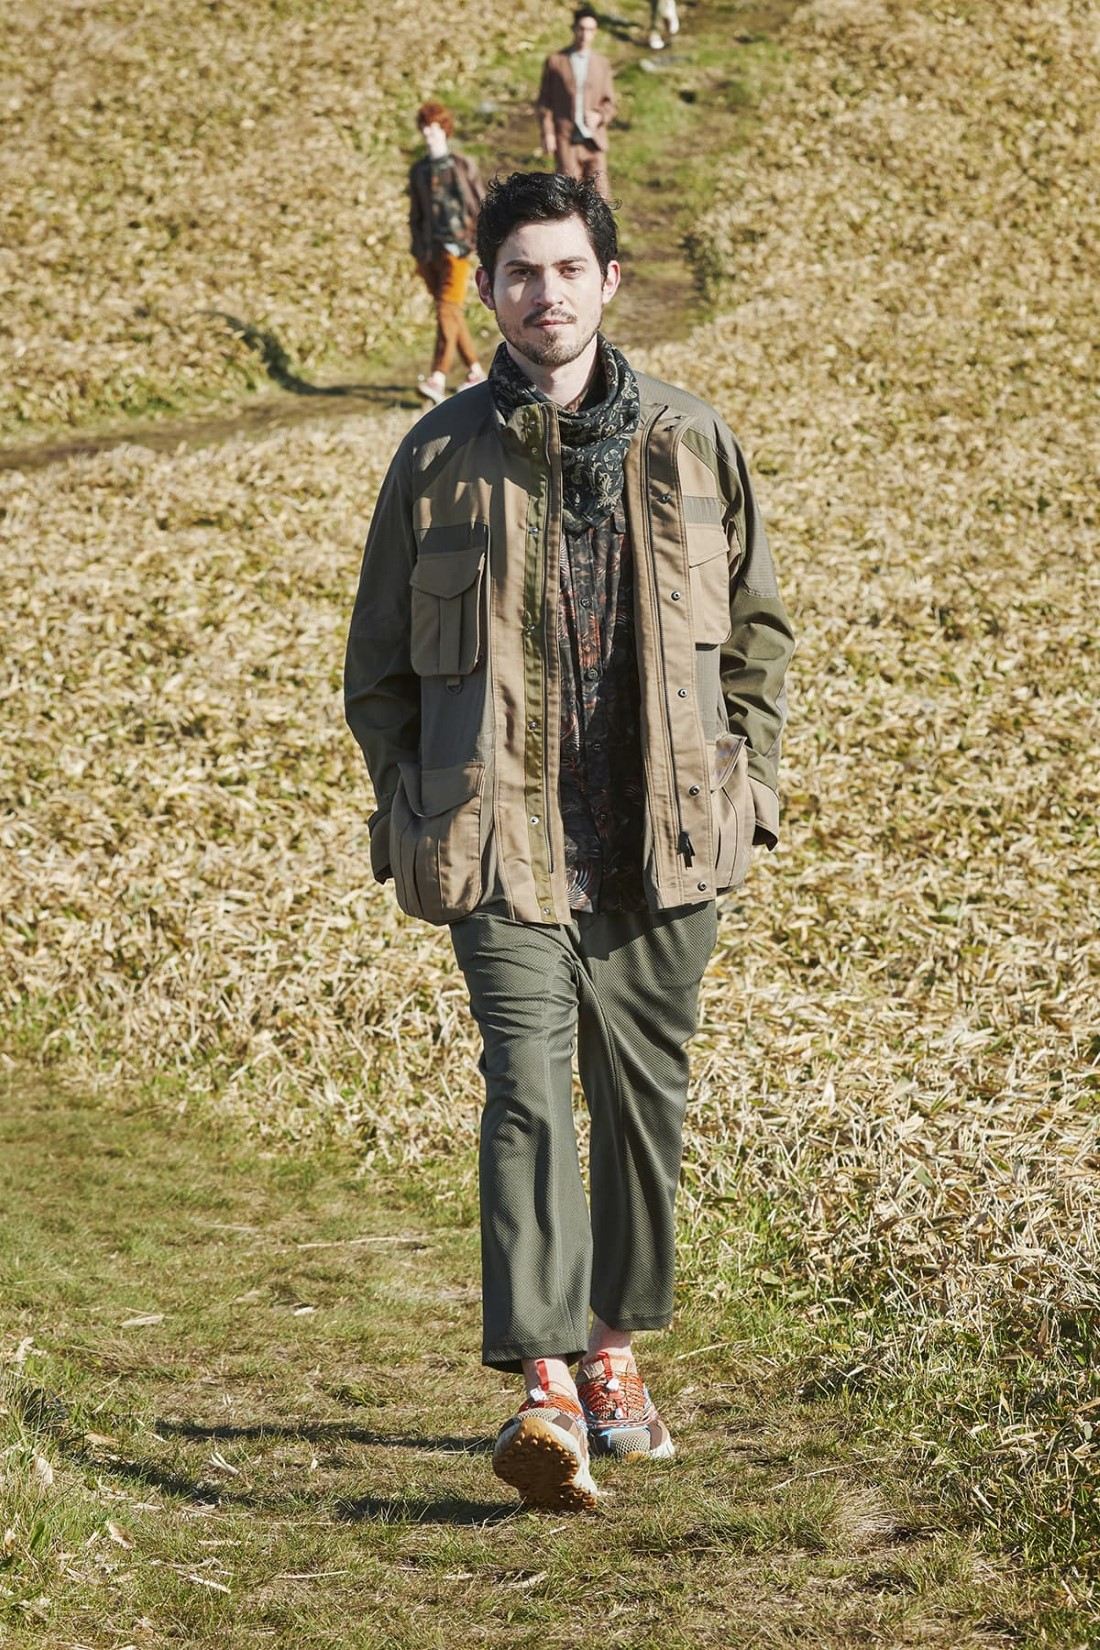 White Mountaineering - Printemps-Été 2022 - Paris Fashion Week